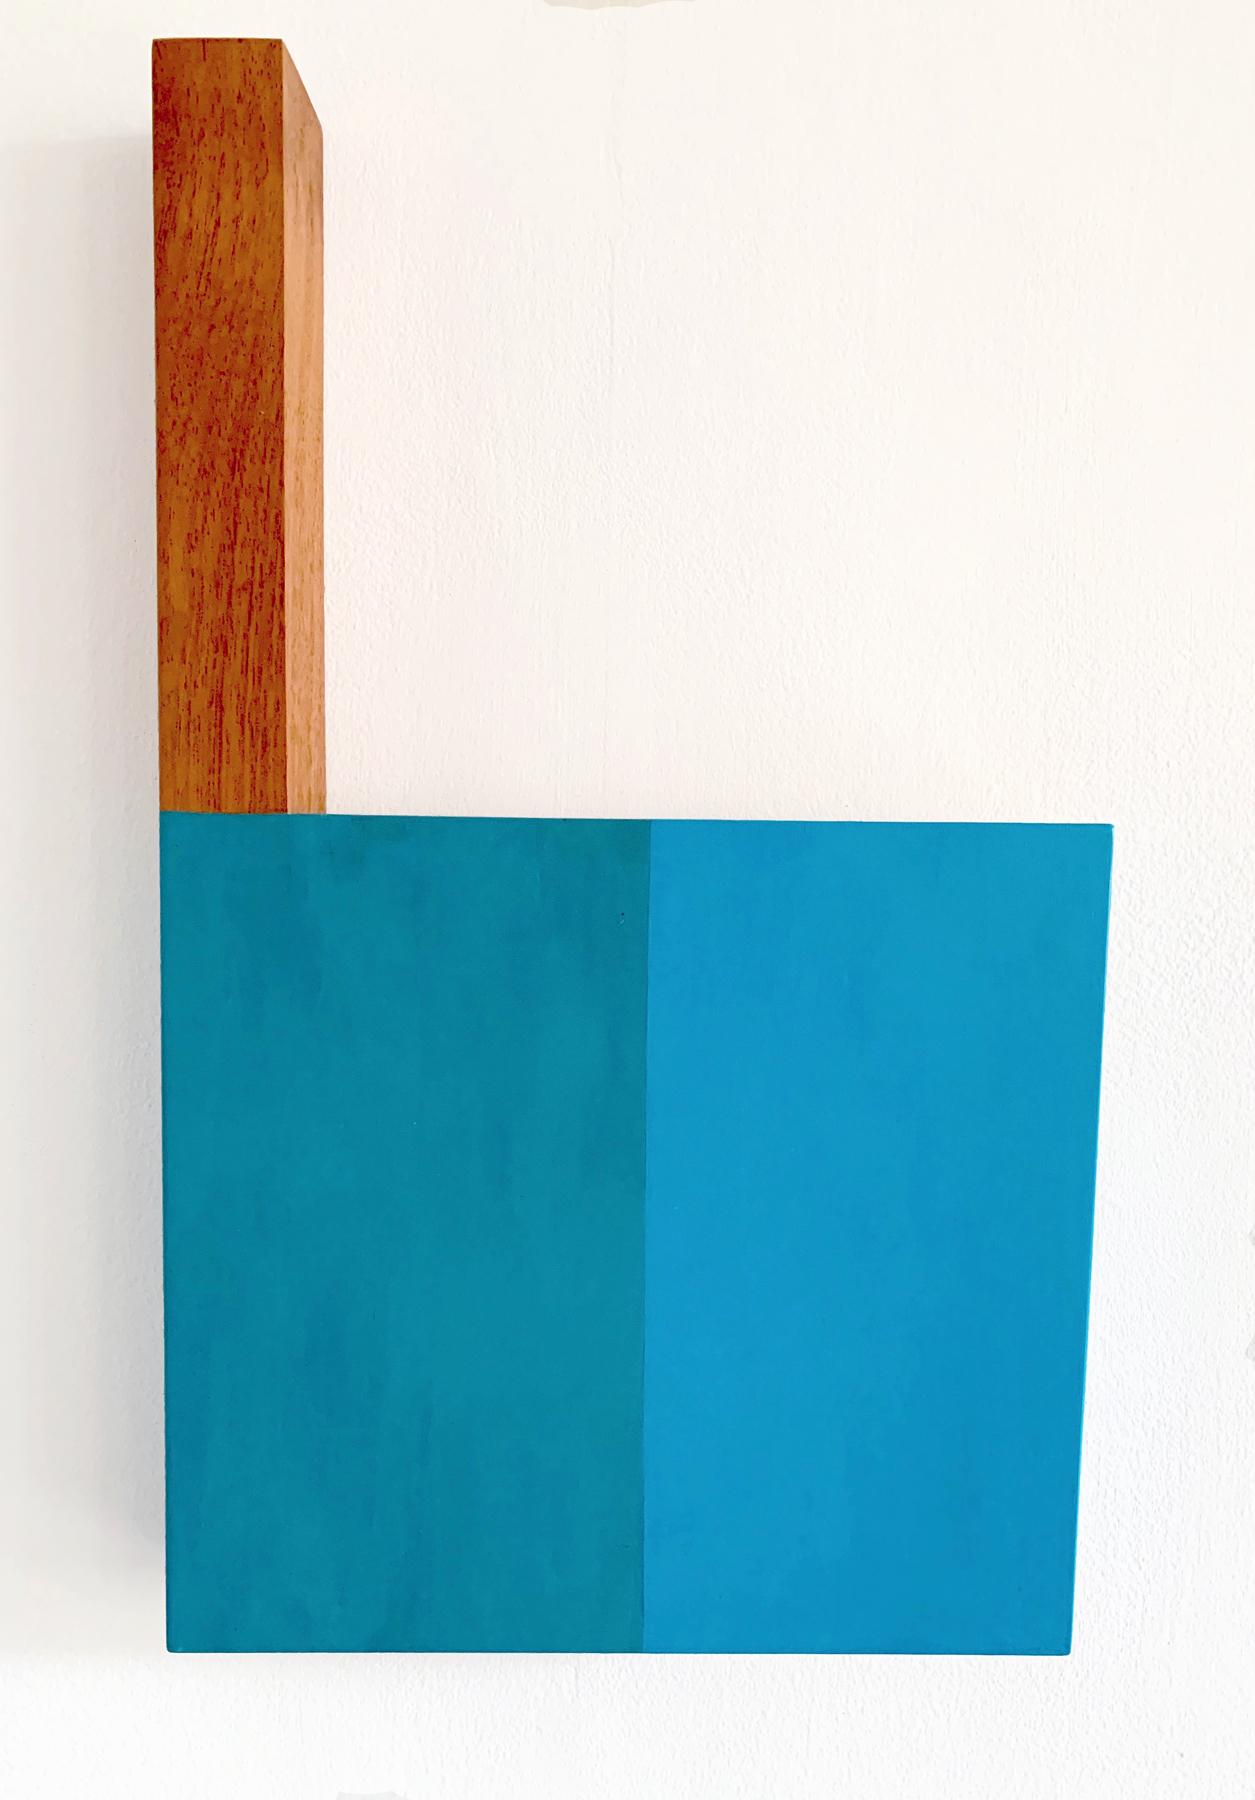 Turk Street 1967, 22.75 x 13.5 x 2.375 inches / 58 x 34 x 6 cm, acrylic on birch veneer plywood and sapele, 2018